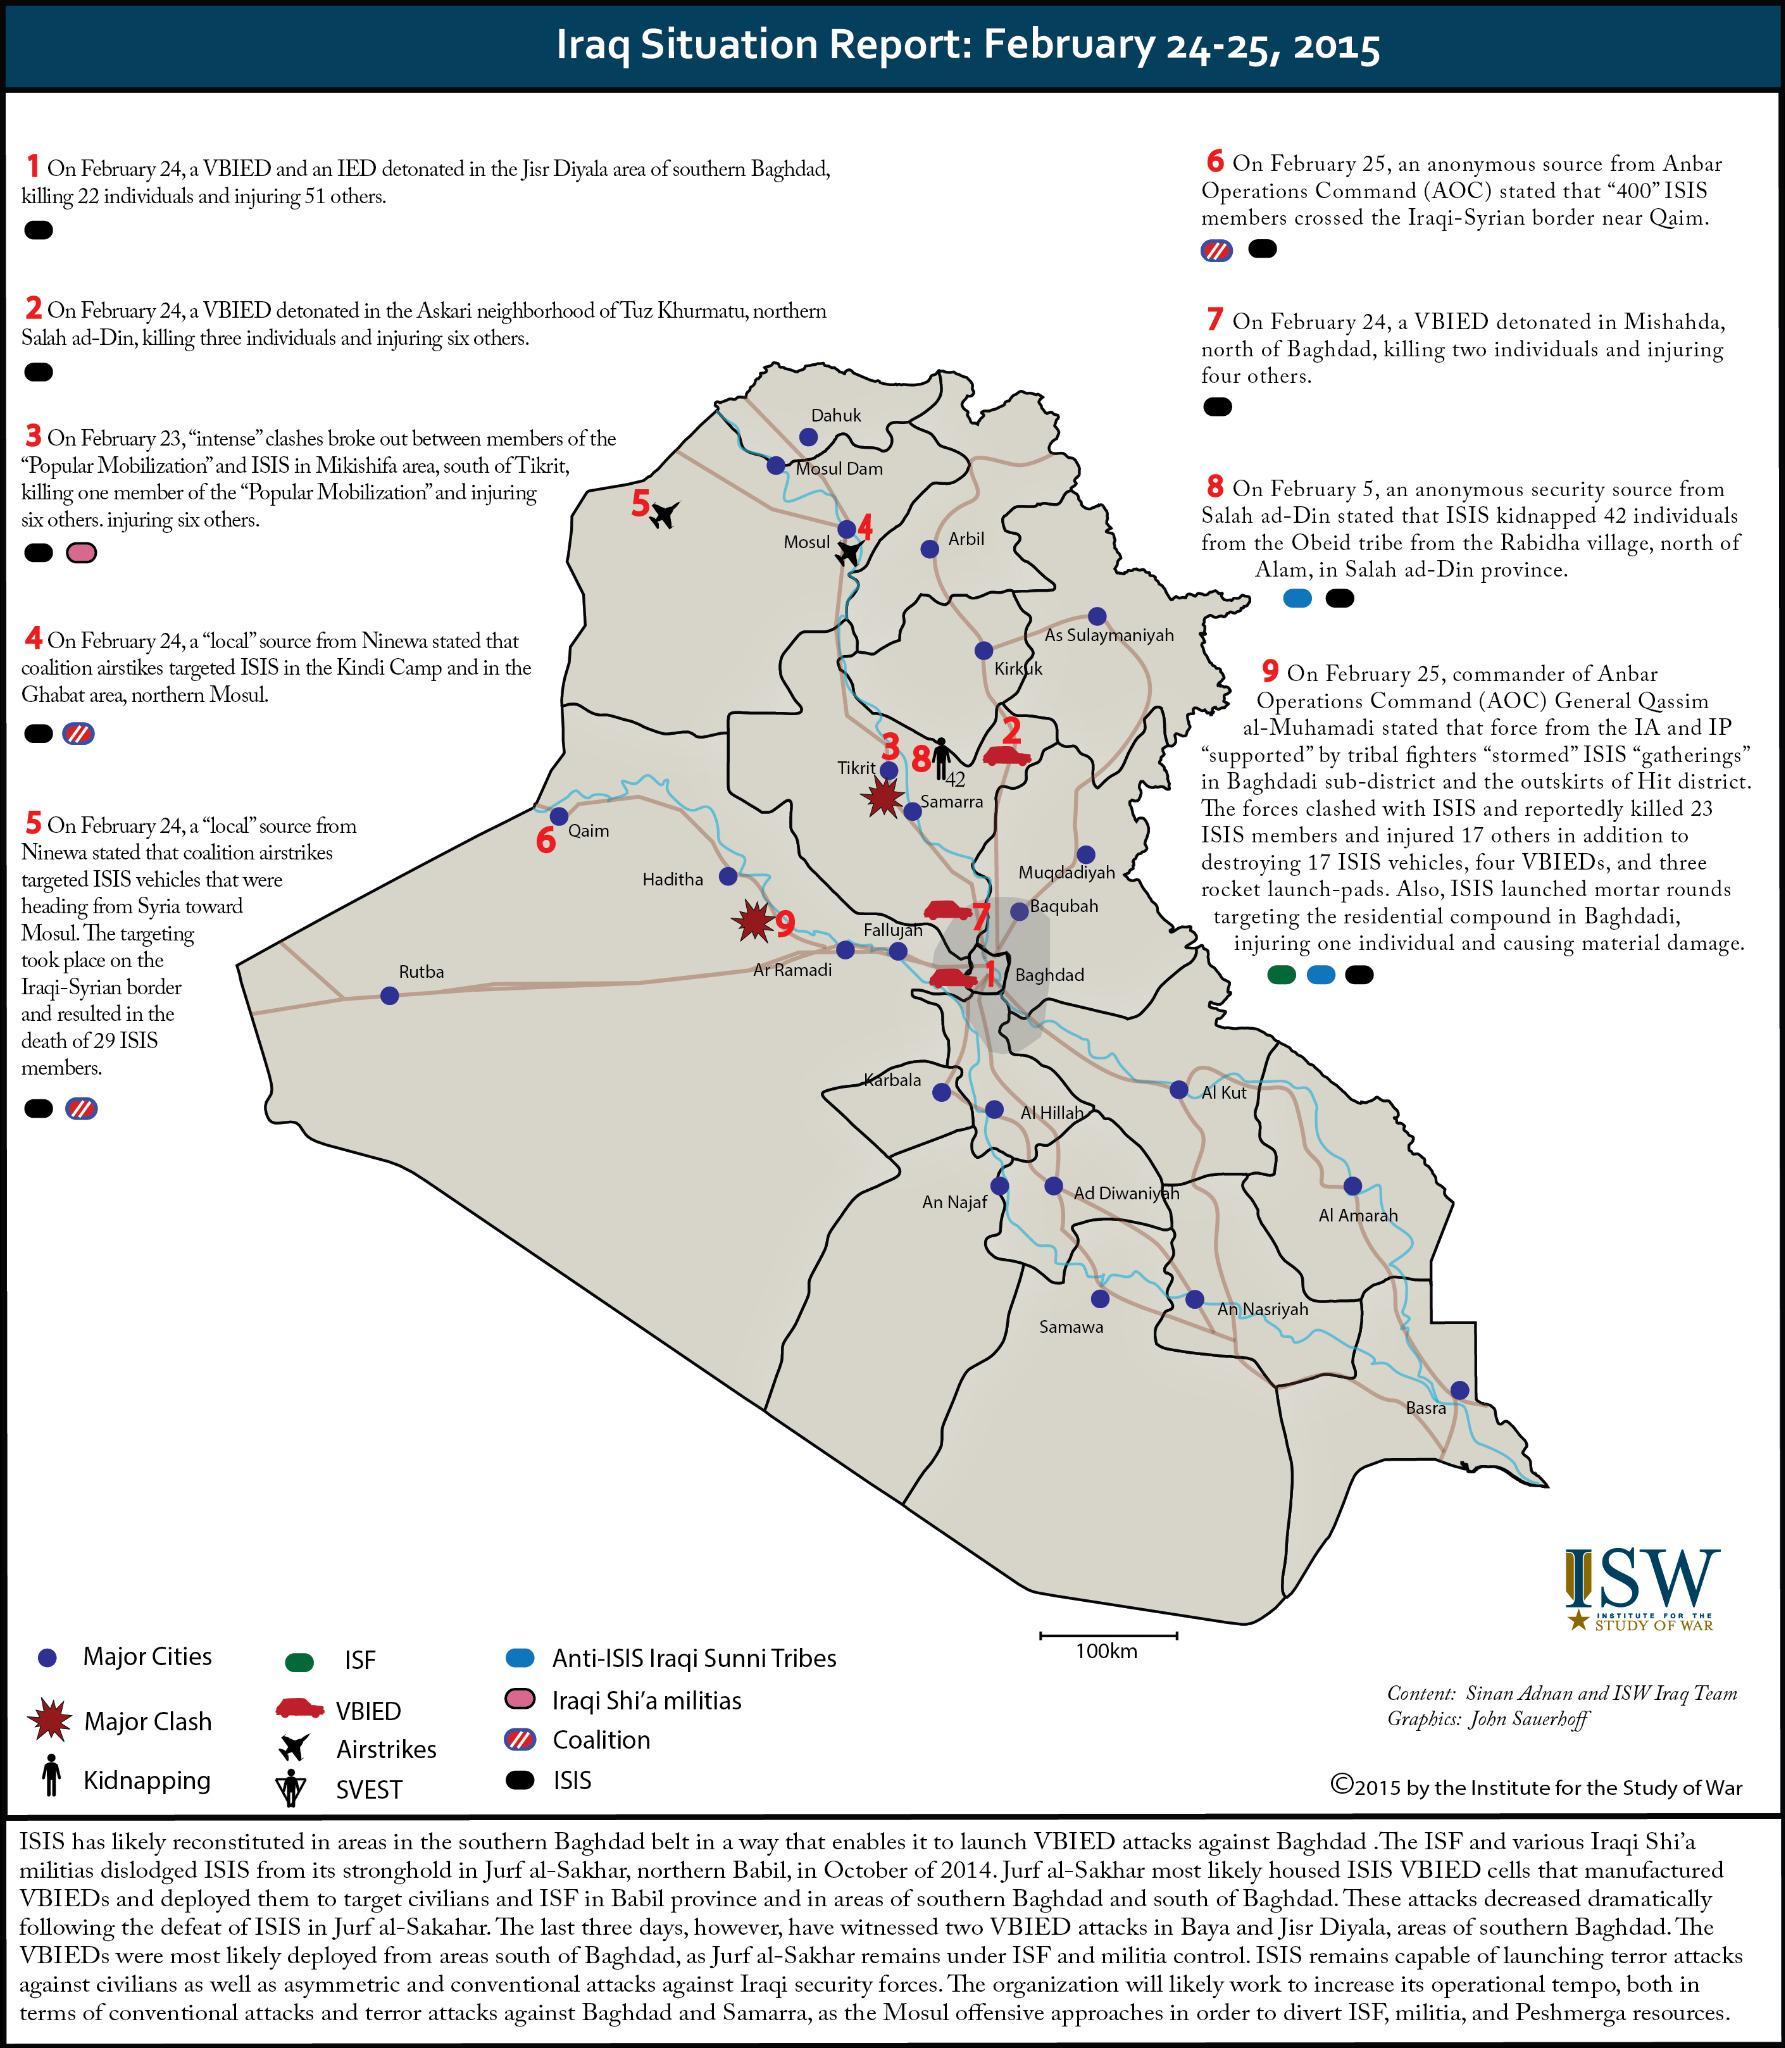 Début de révolte en Irak? - Page 6 B-uzu_8W0AAxwT2